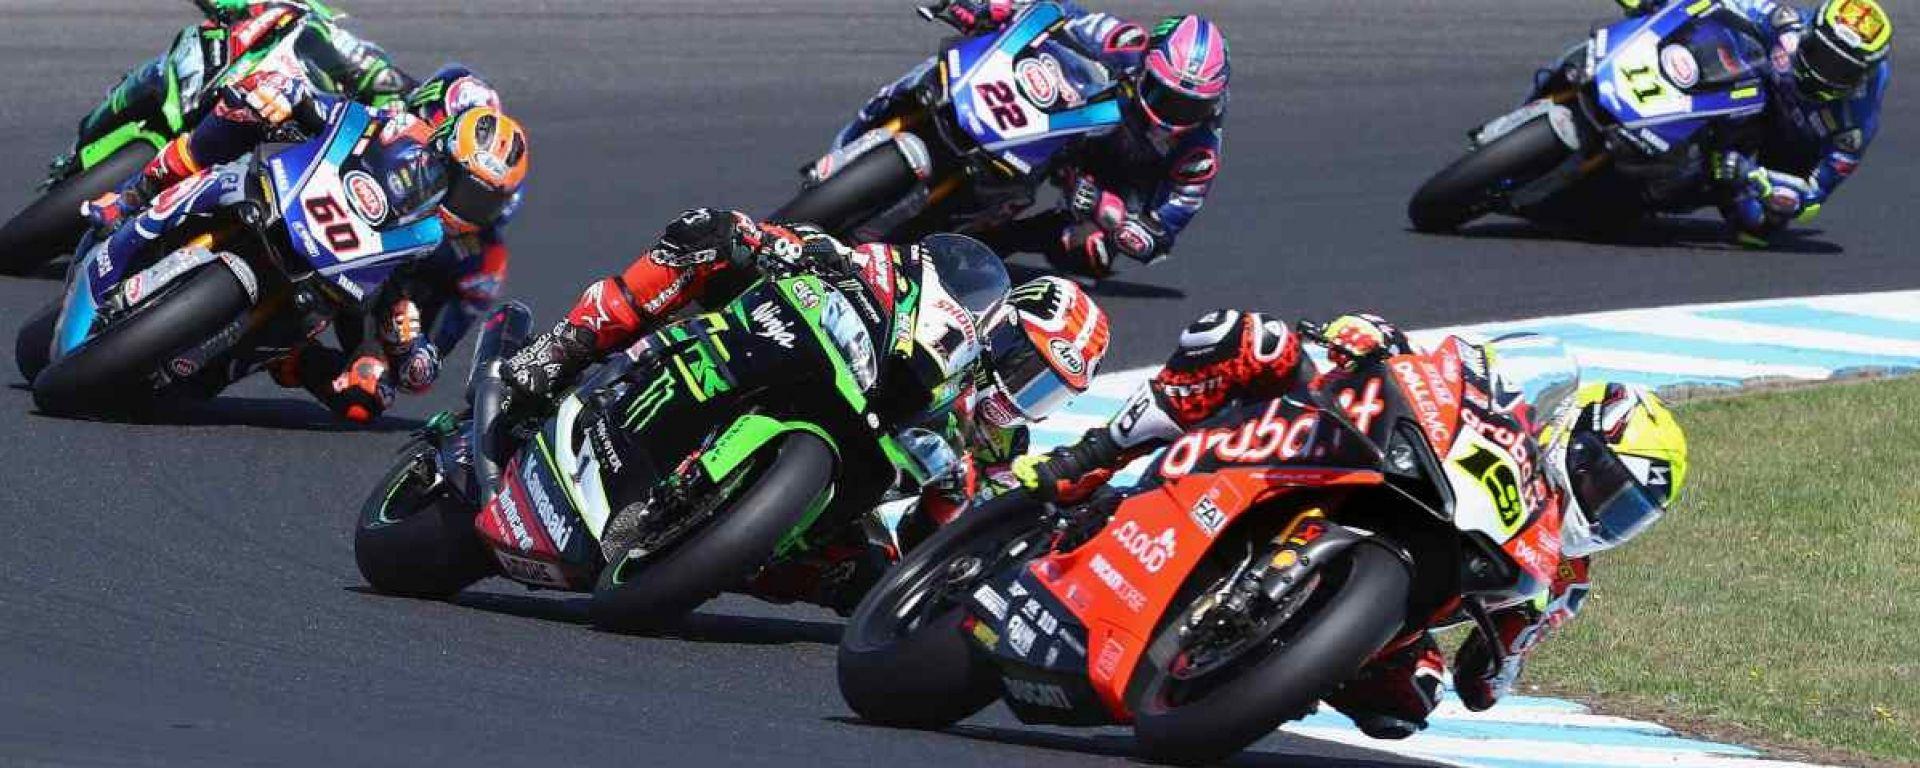 Domani torna la Superbike ad Aragon. Chi fermerà Bautista?